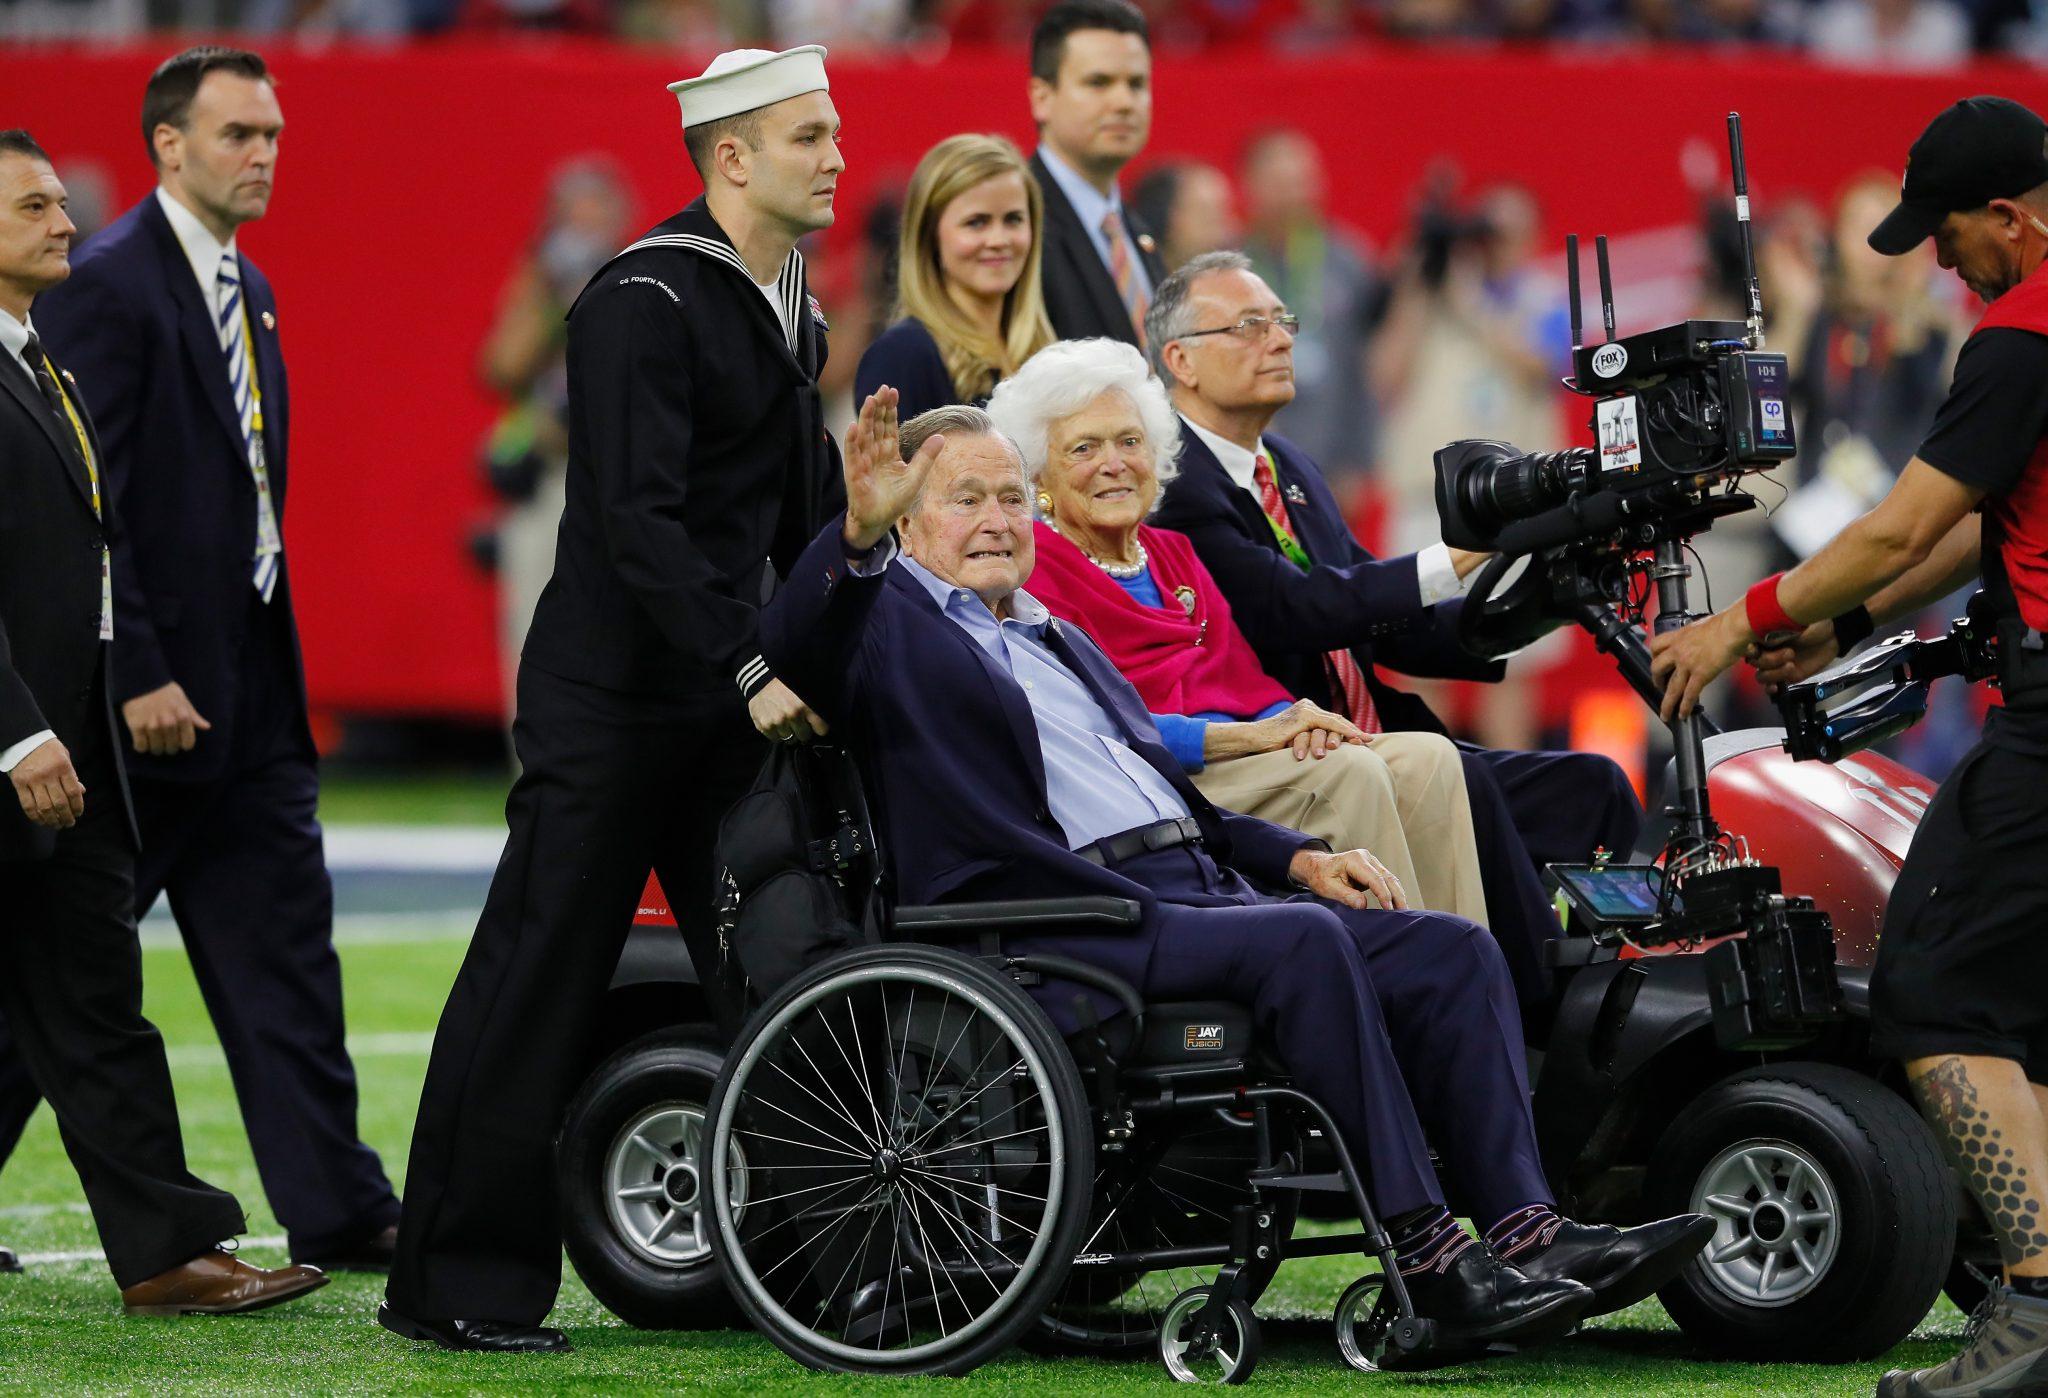 George H. W. Bush and Barbara Bush